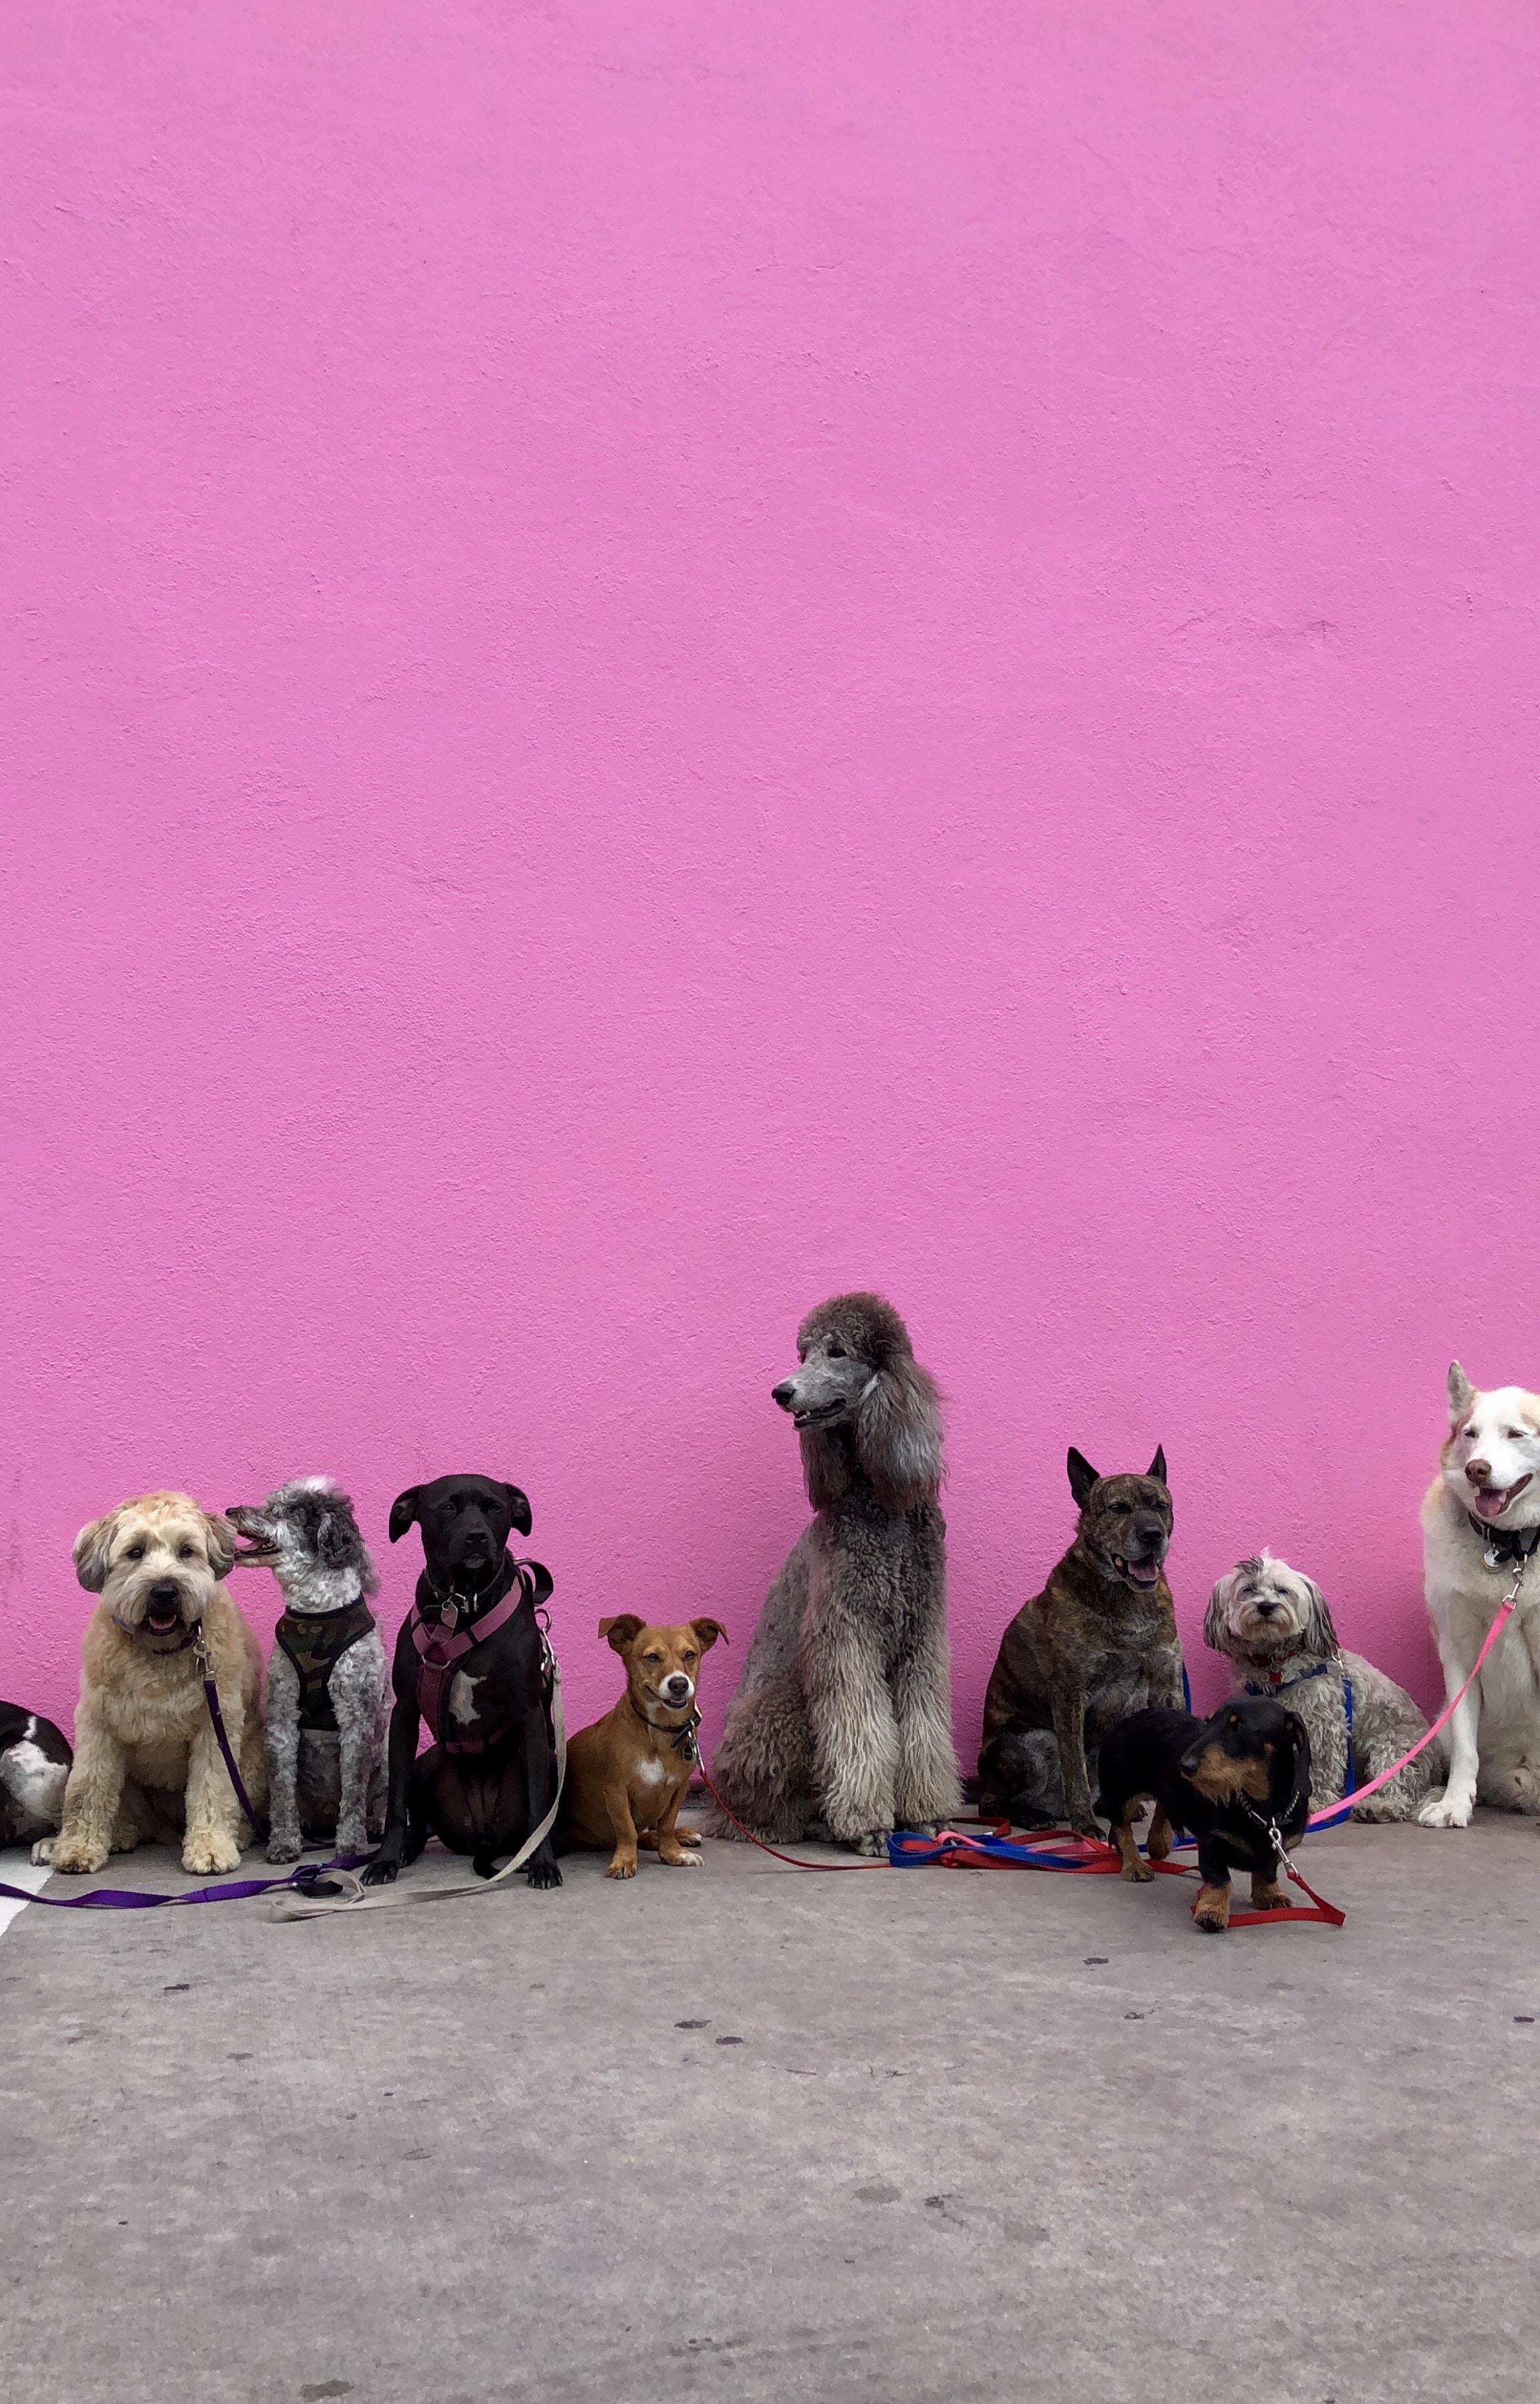 litter of dogs fall in line beside wall